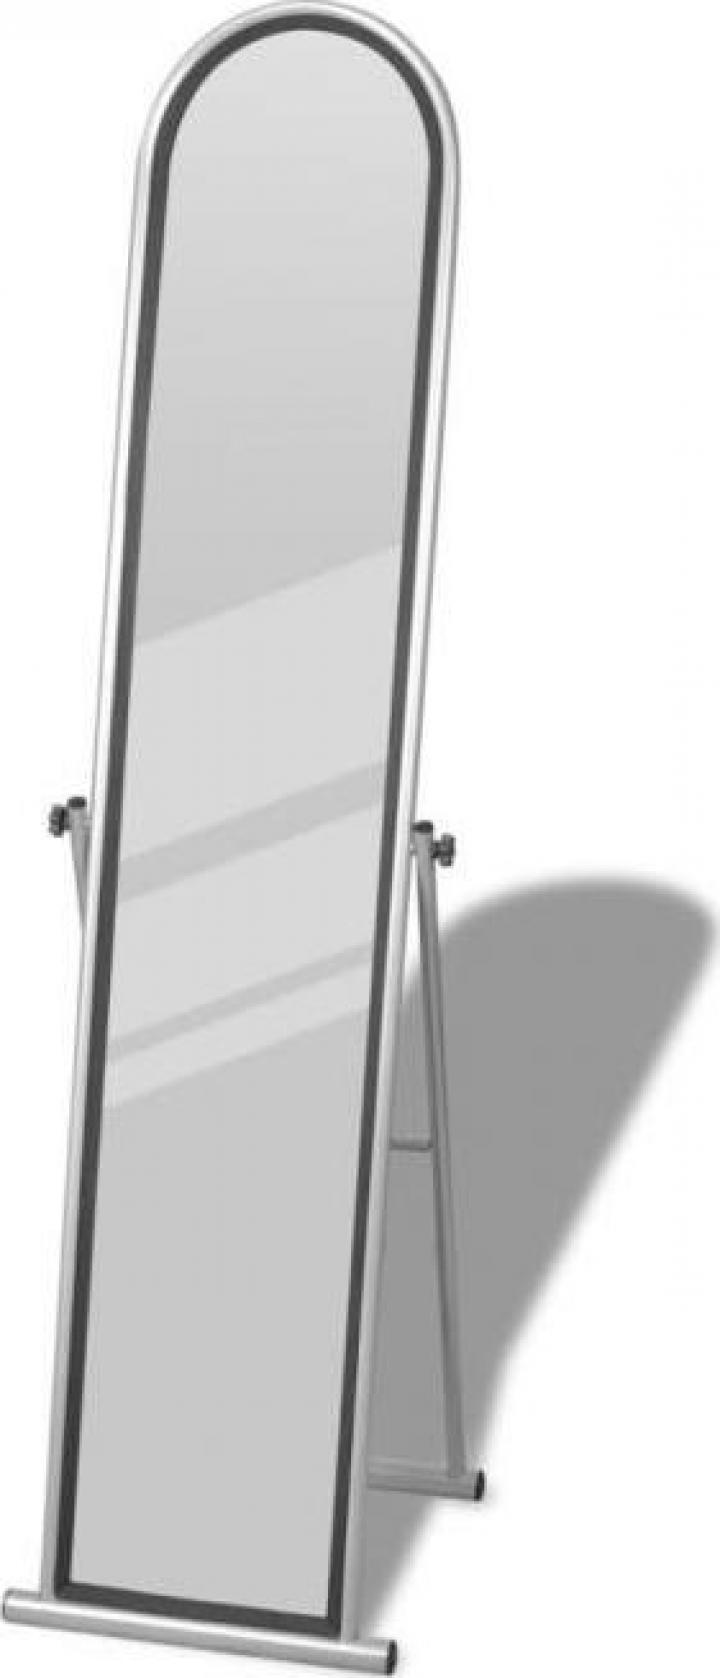 Oglinda de podea cu suport rectangulara gri